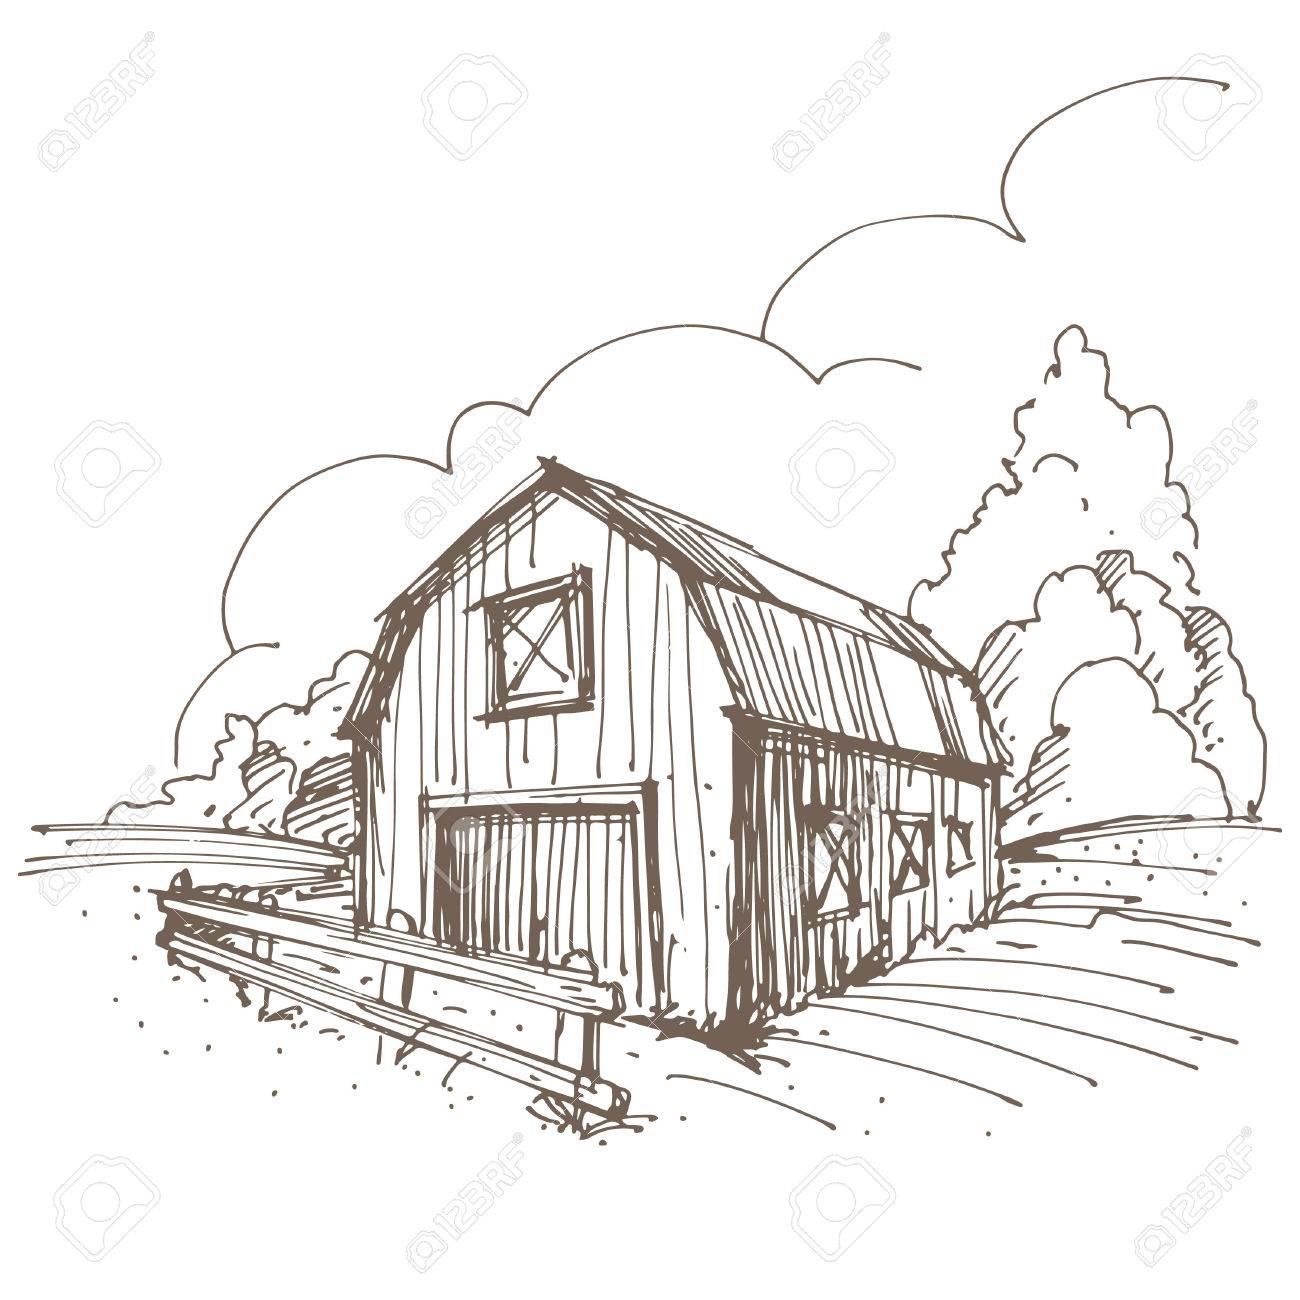 Farm Barn Drawing hand drawn illustration of a farm. royalty free cliparts, vectors